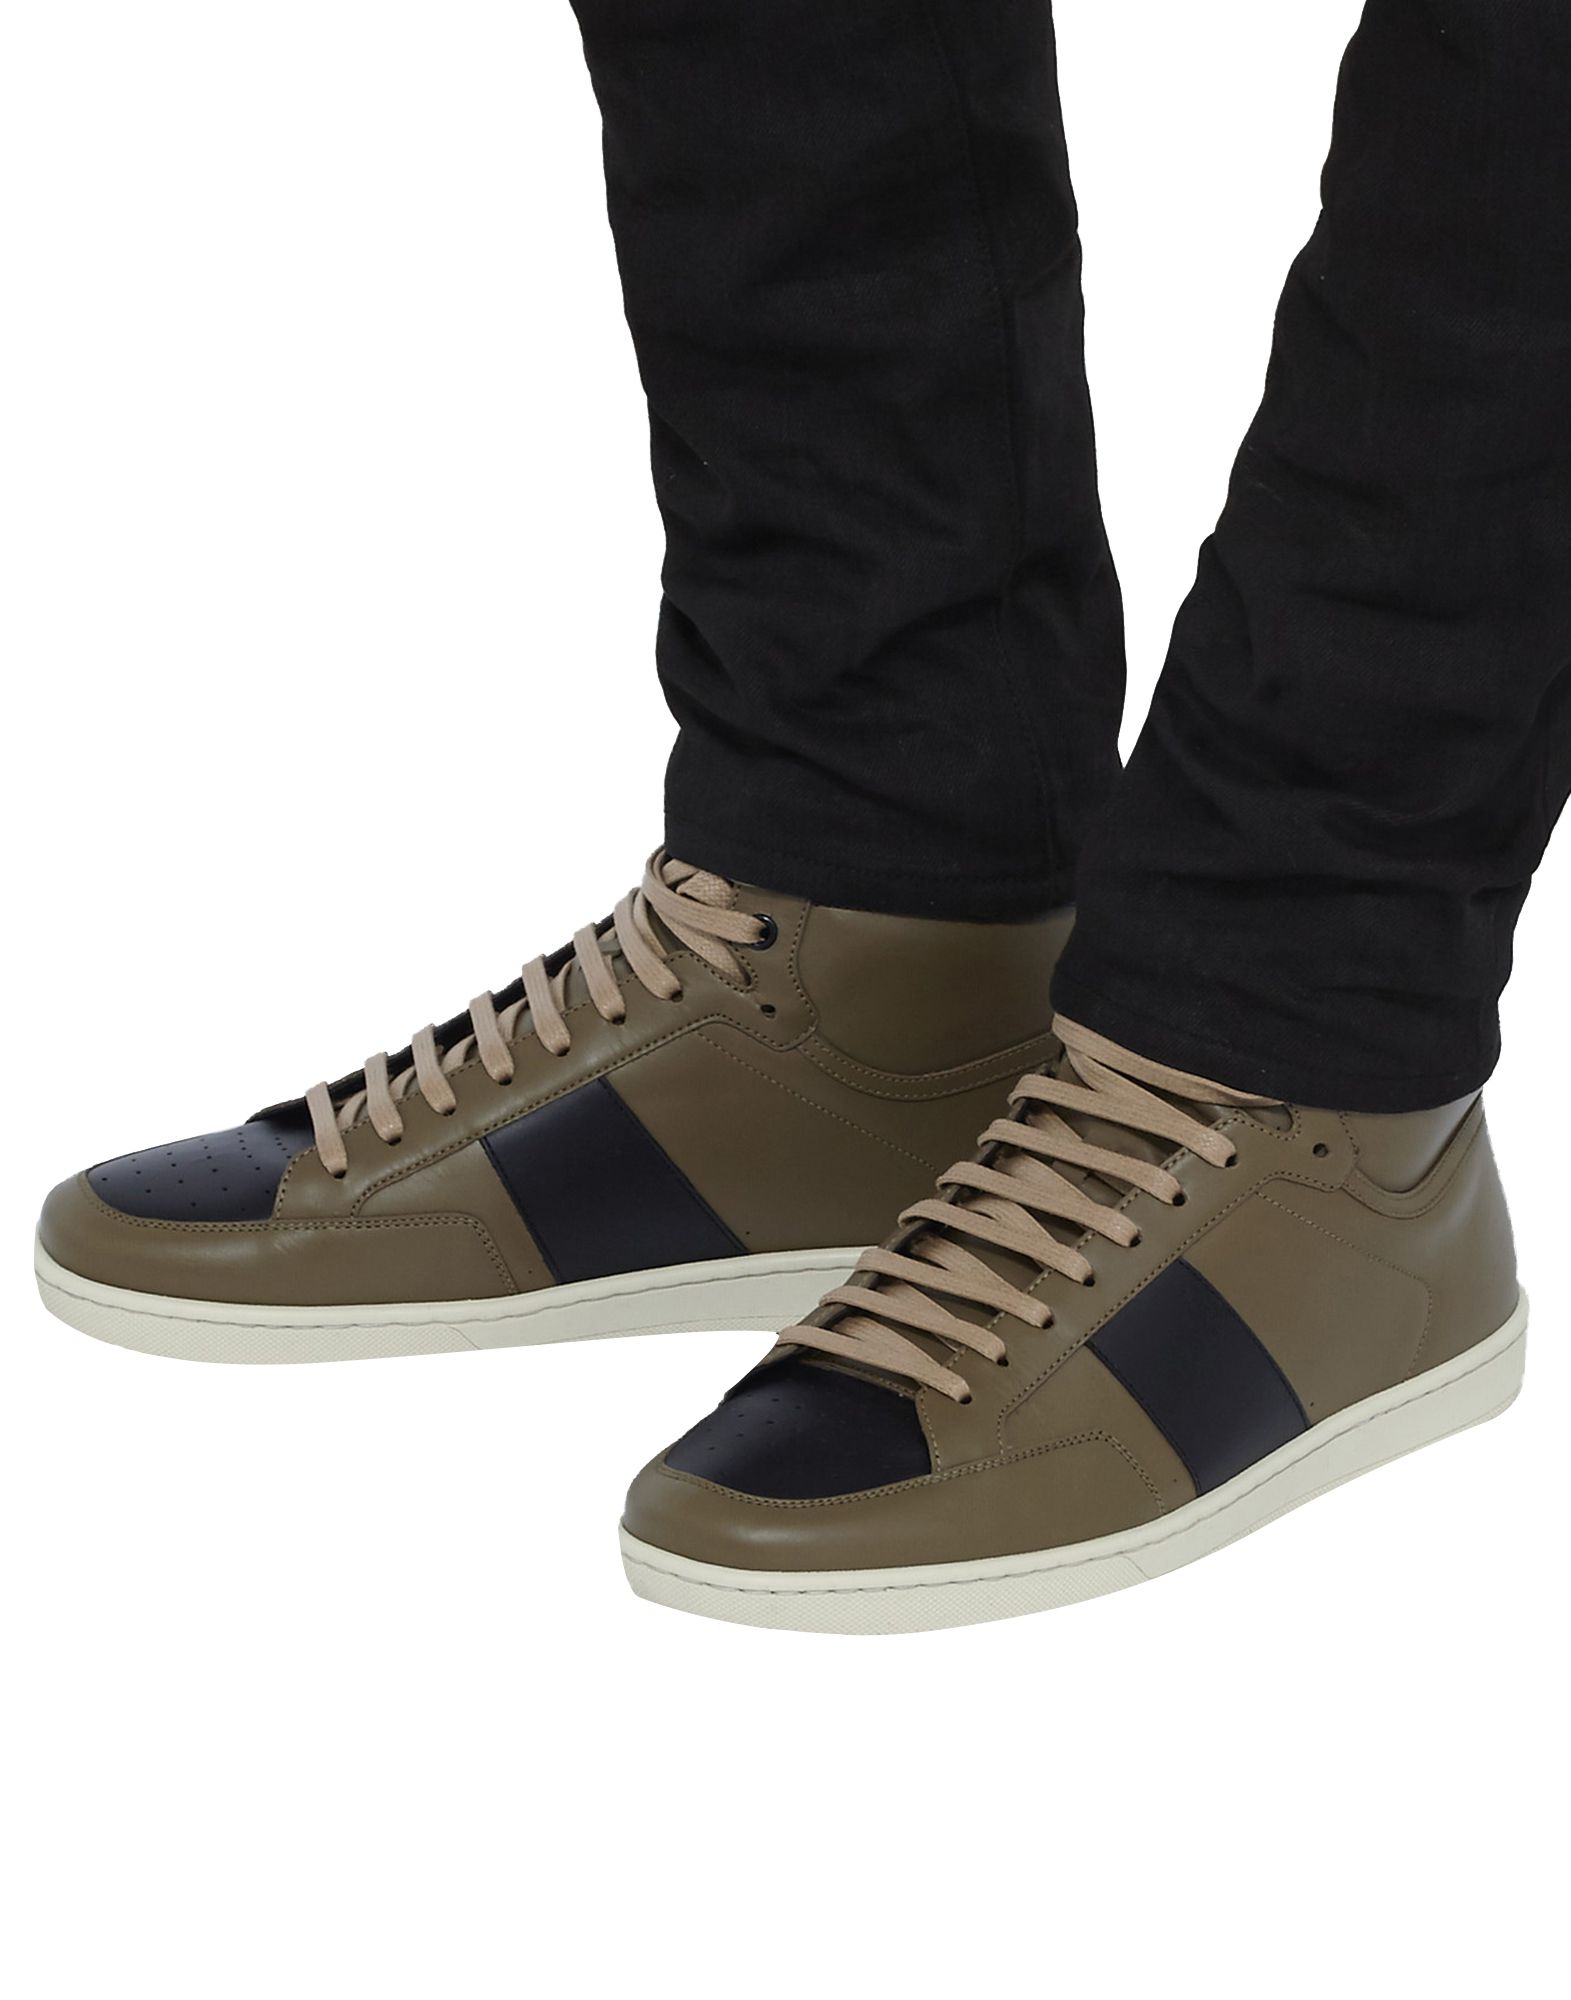 Saint Laurent Sneakers Qualität Herren  11402547LB Gute Qualität Sneakers beliebte Schuhe 3767a0